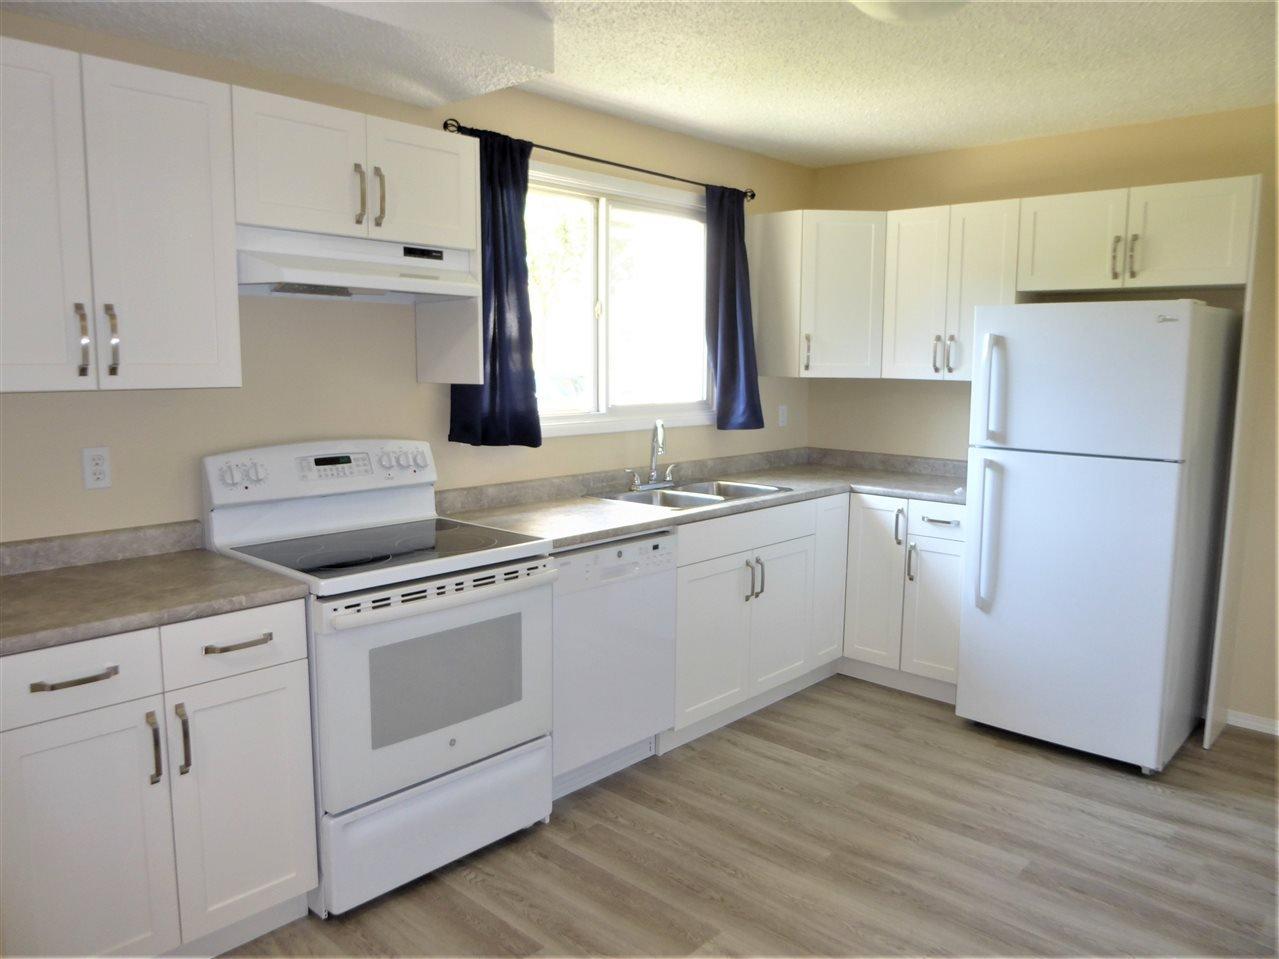 Main Photo: 5627 137 Avenue in Edmonton: Zone 02 Townhouse for sale : MLS®# E4209385